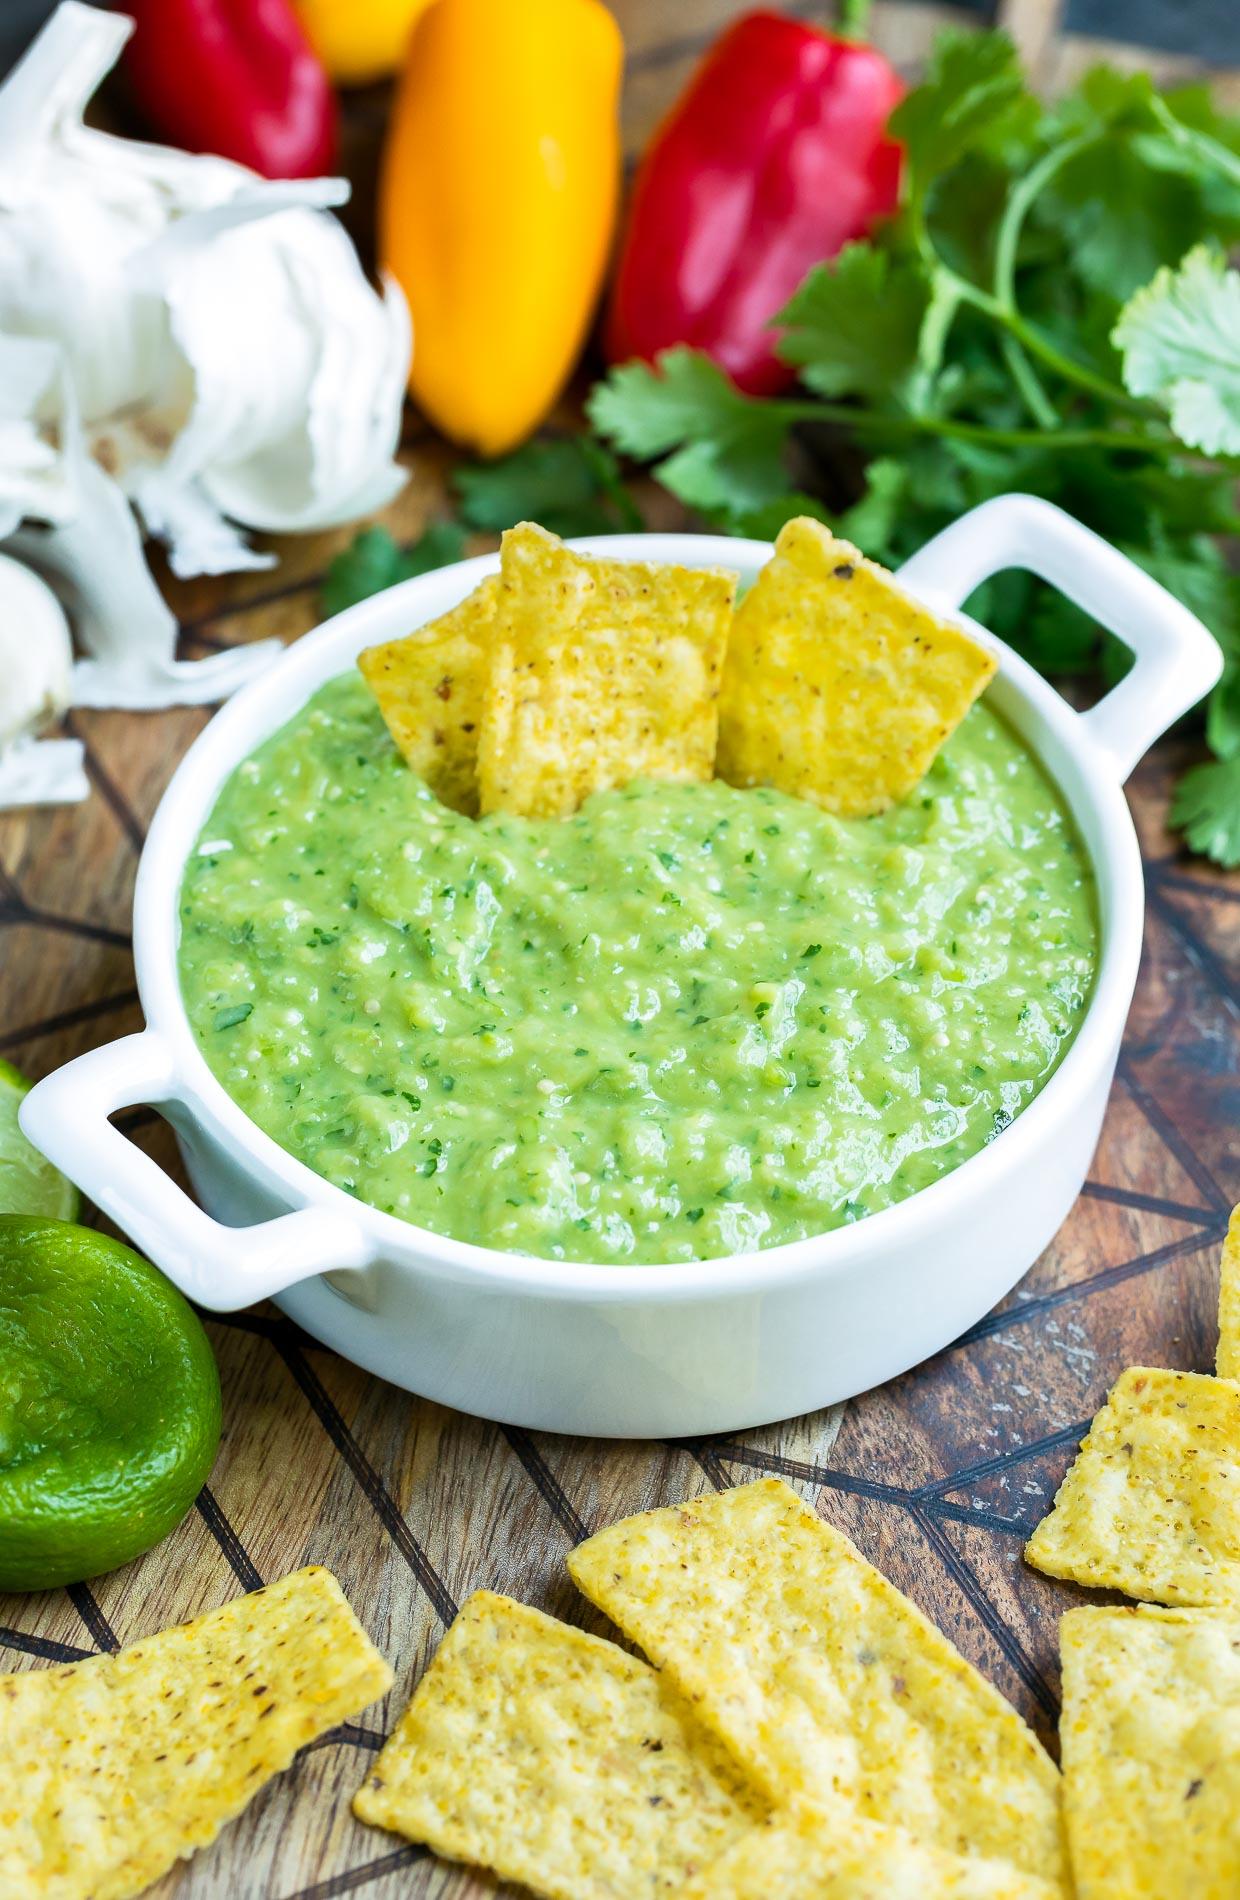 Avocado Salsa Verde Dip with tortilla chips